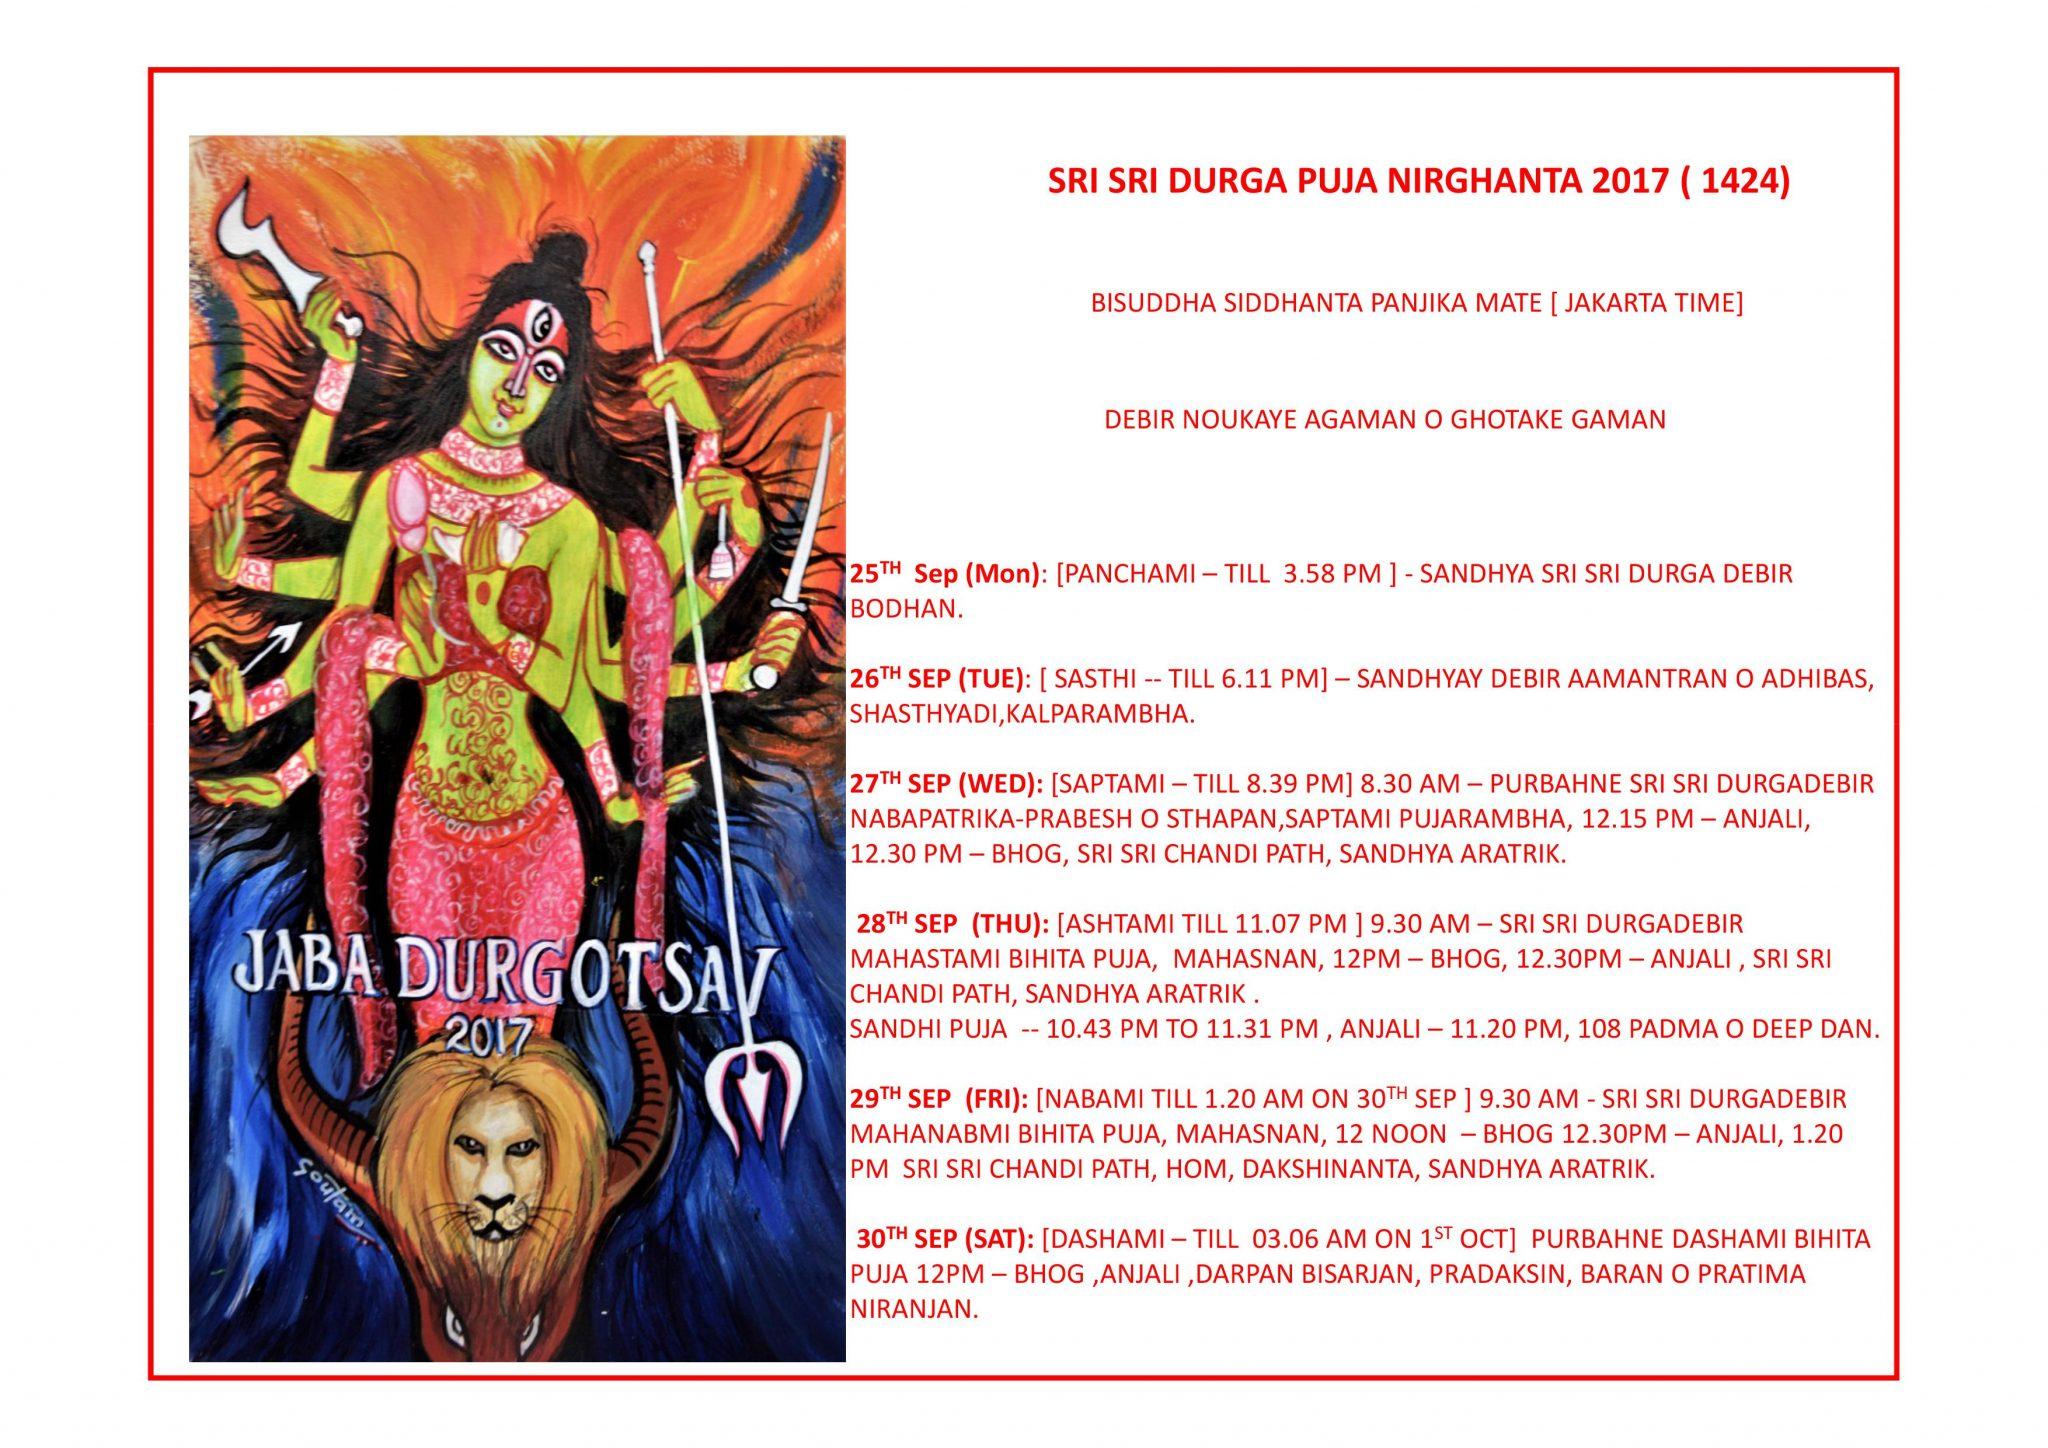 Jakarta Bengali Association's Durga Puja 2017